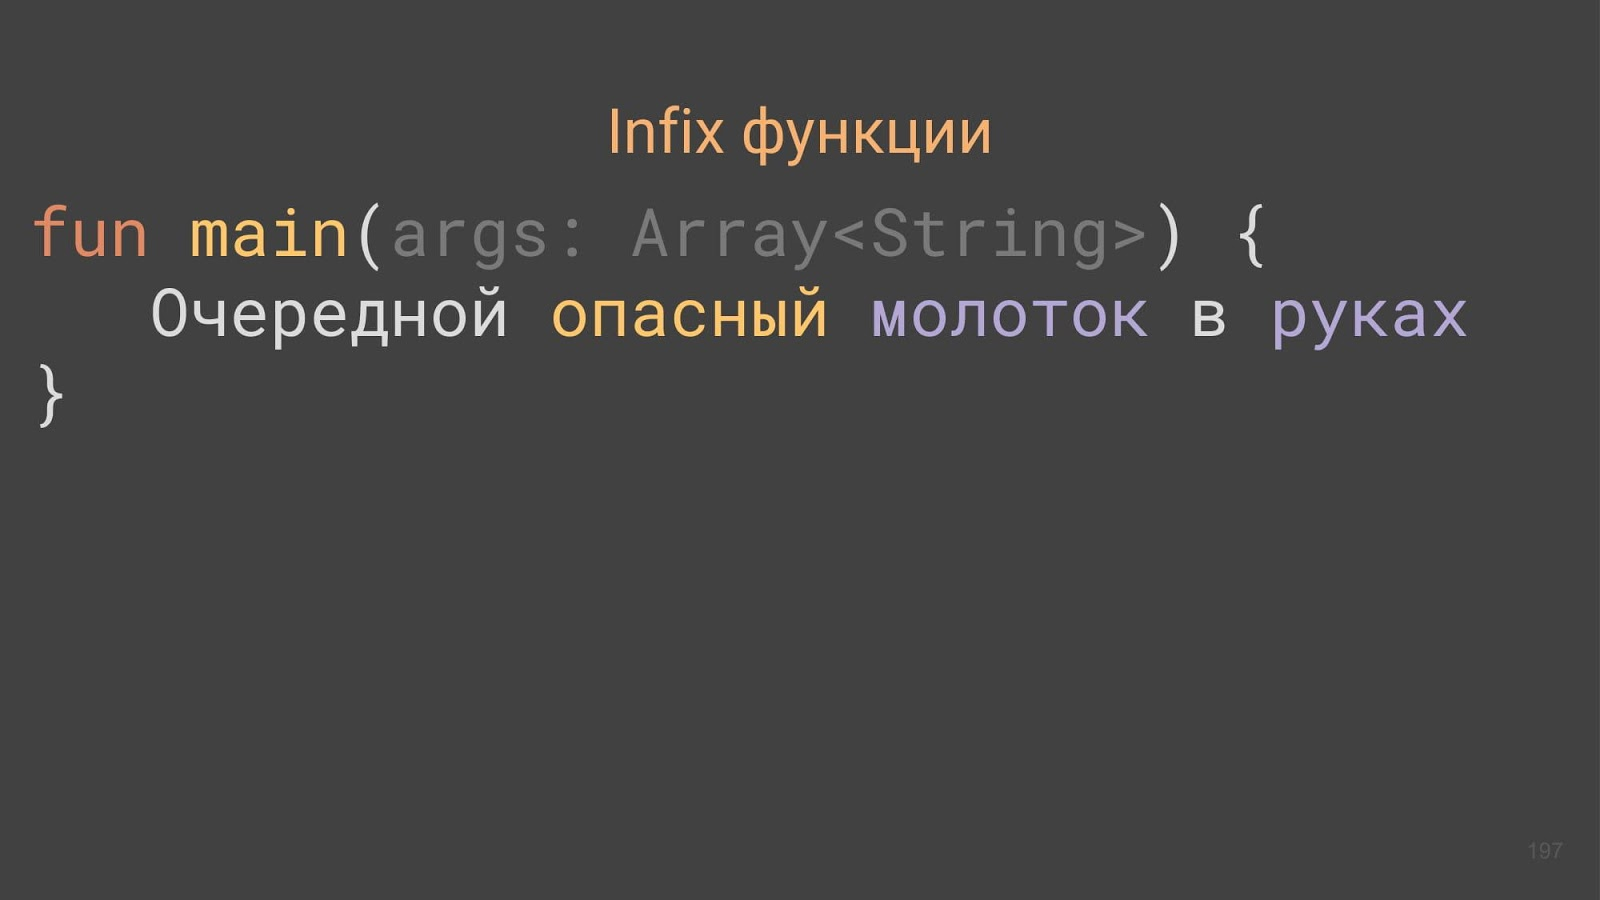 a041e86102be21acf2c3170cf941d064.jpg